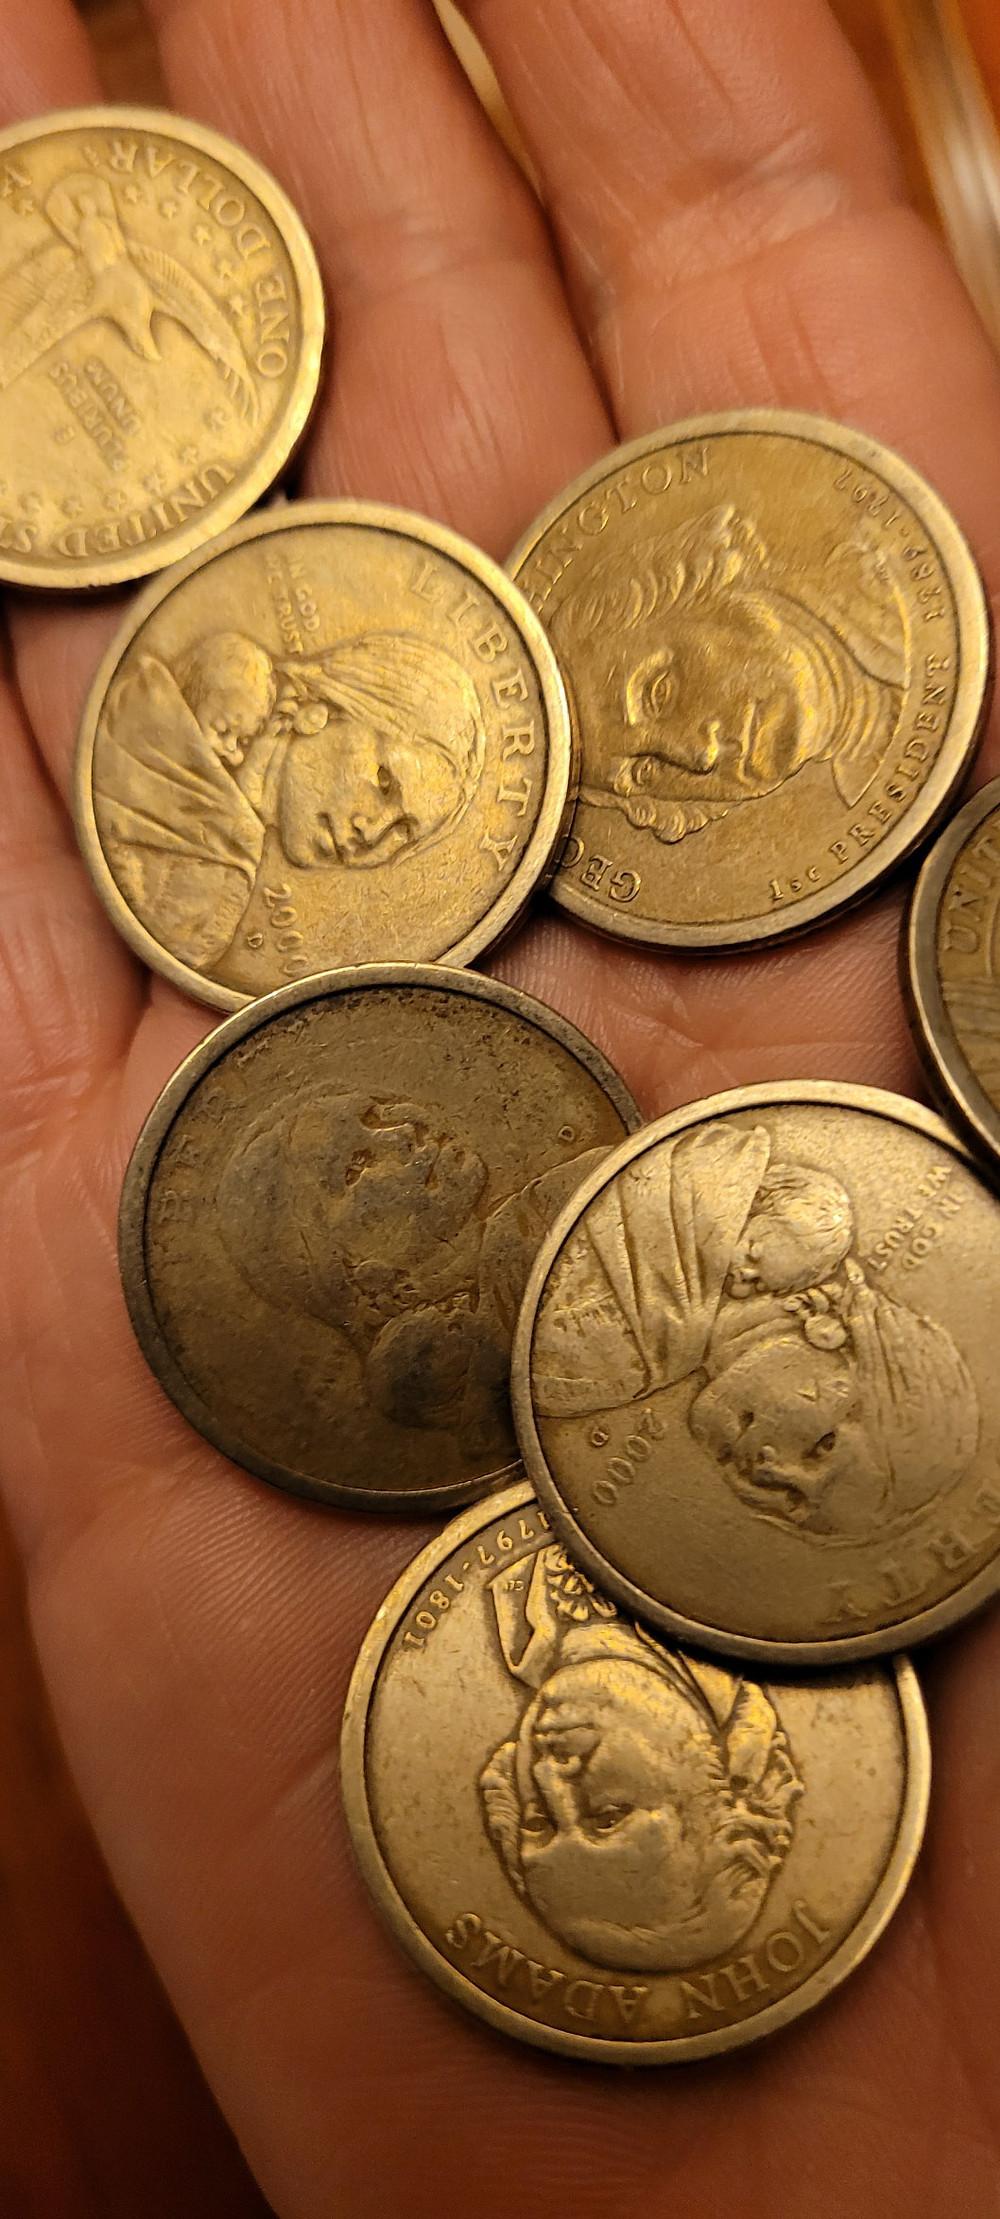 Sacagawea Dollars in Ecuador